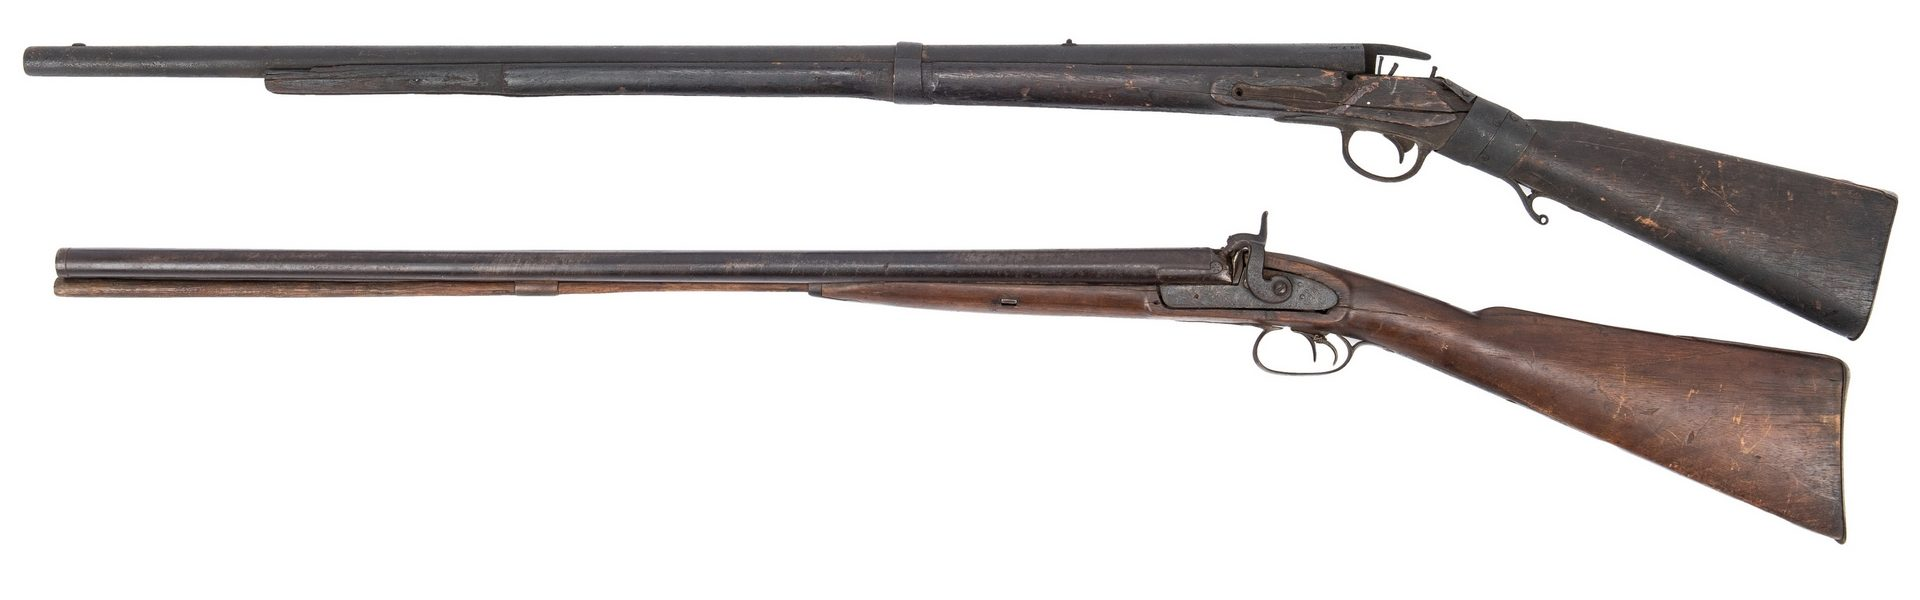 Lot 399: 2 Relic Early/Mid 19th C. Firearms, poss. NC Battlefield